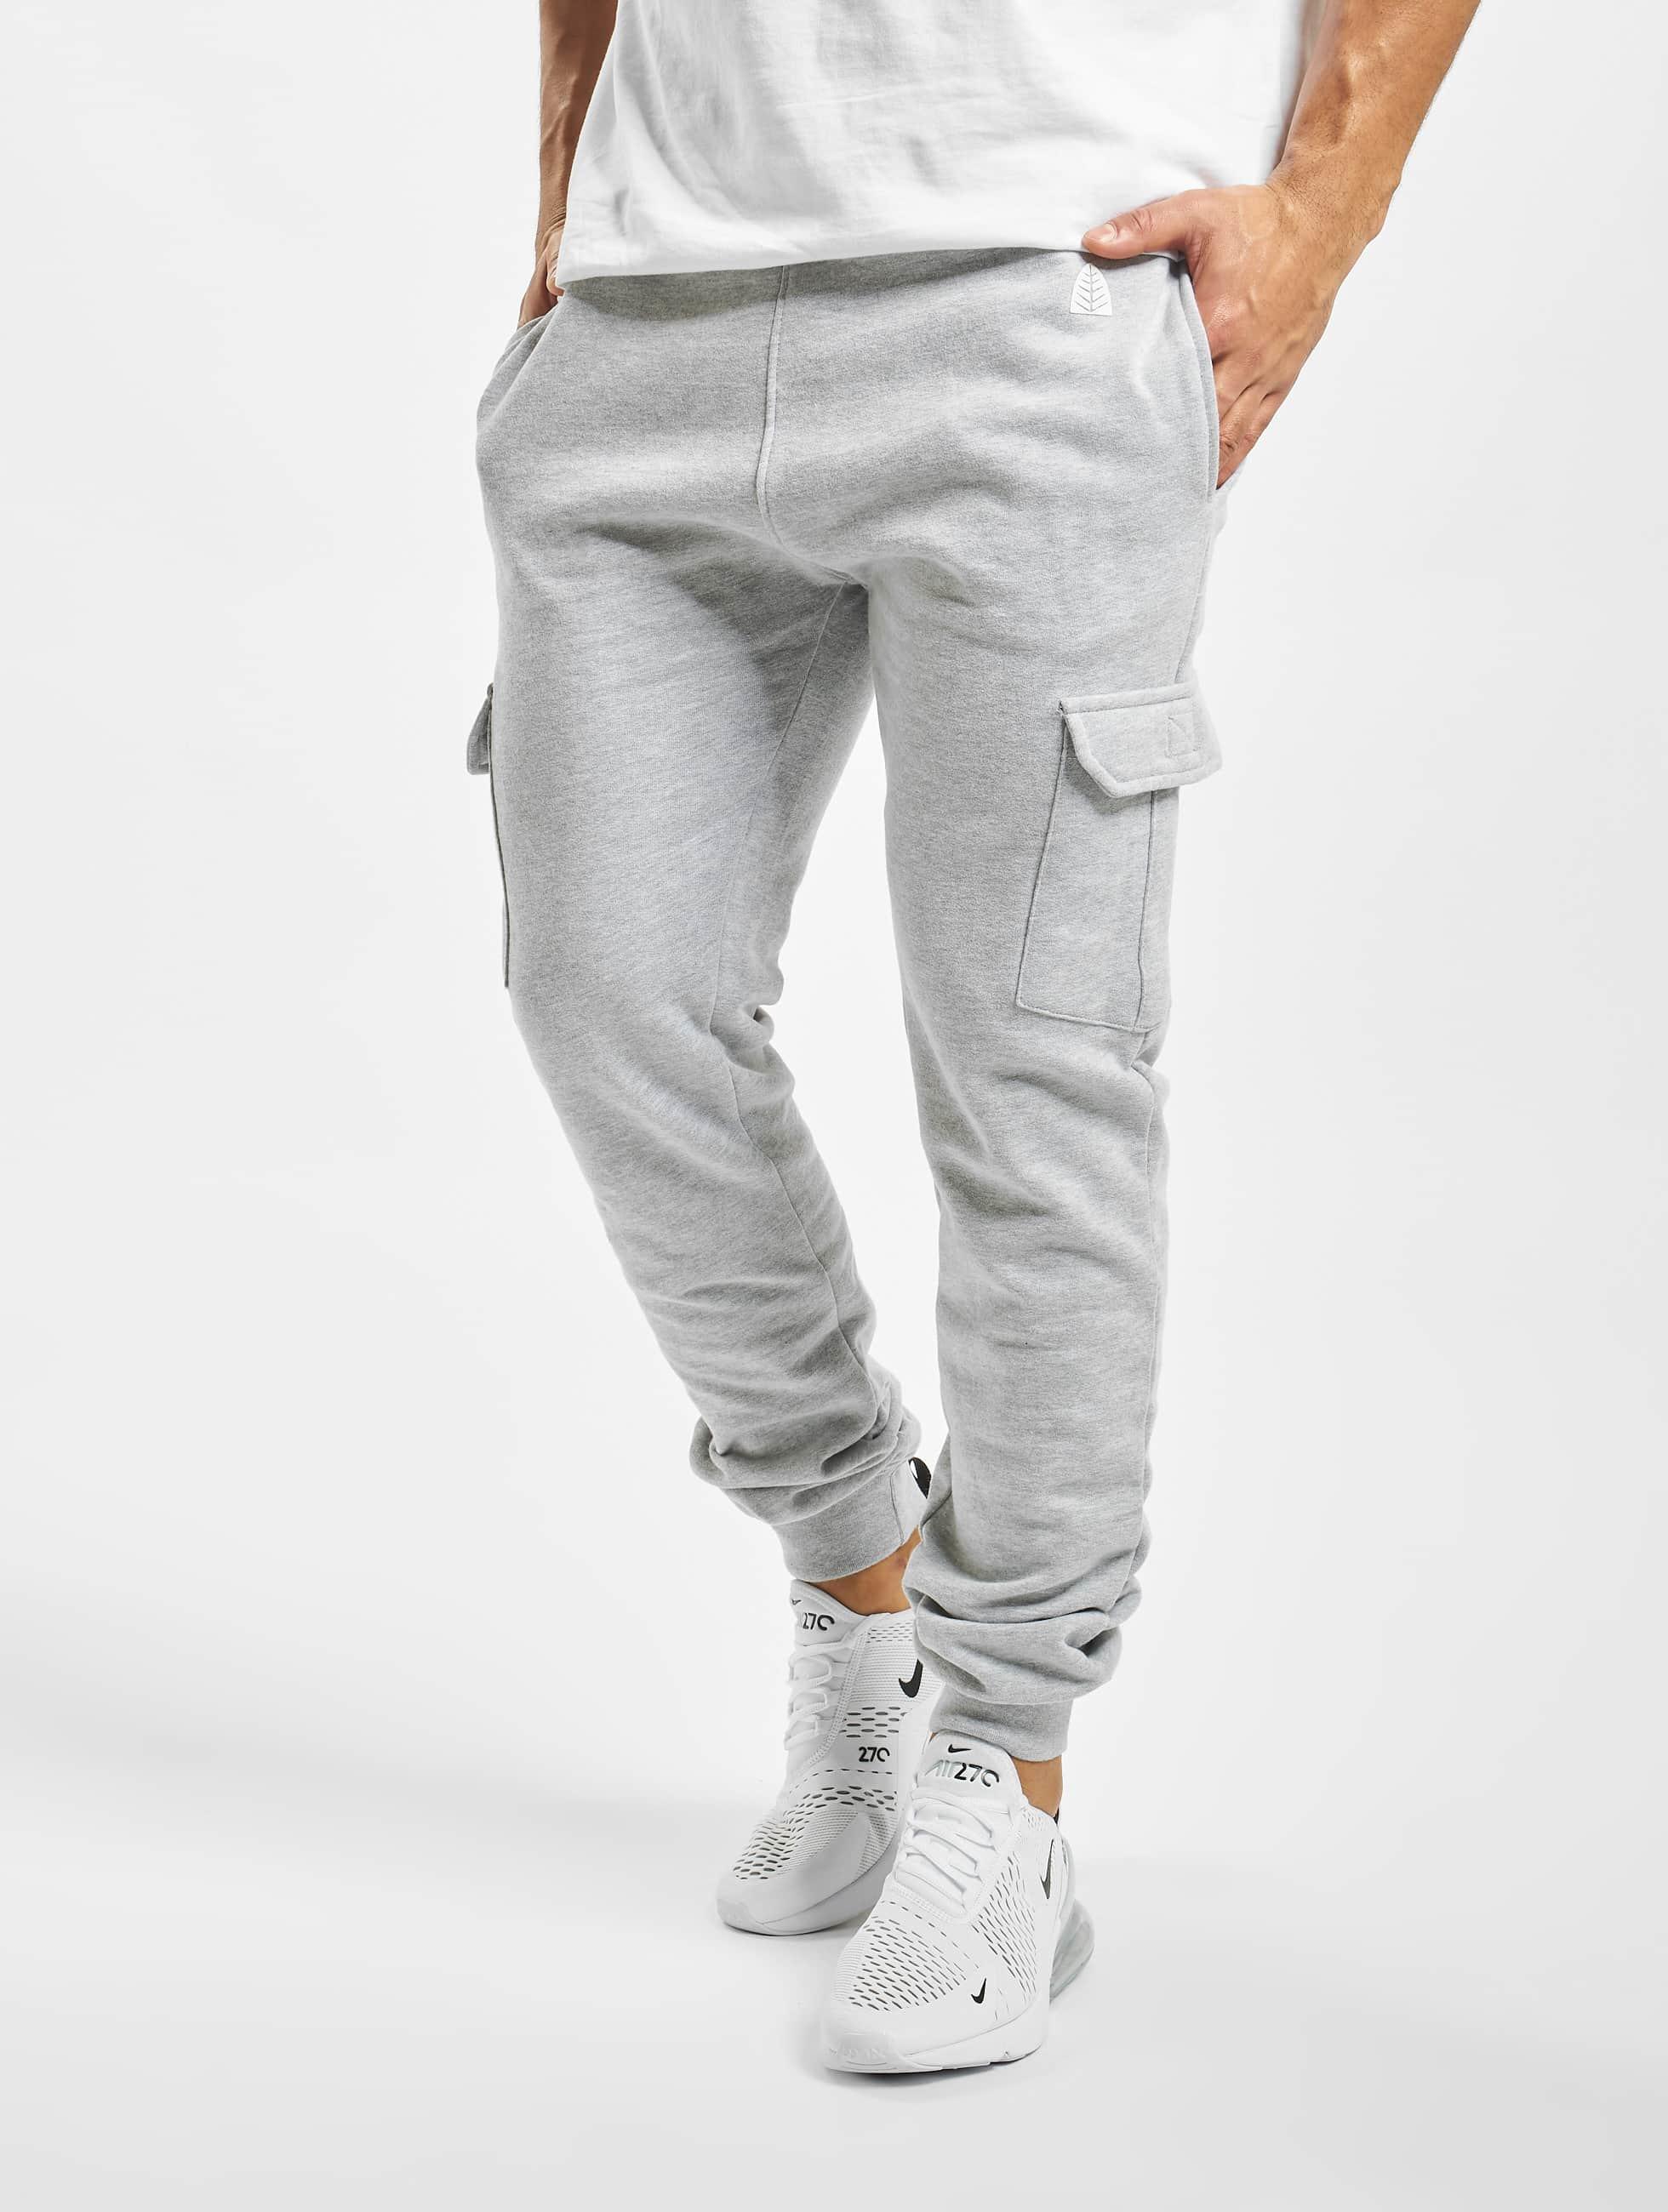 Just Rhyse / Sweat Pant Huaraz in grey 2XL